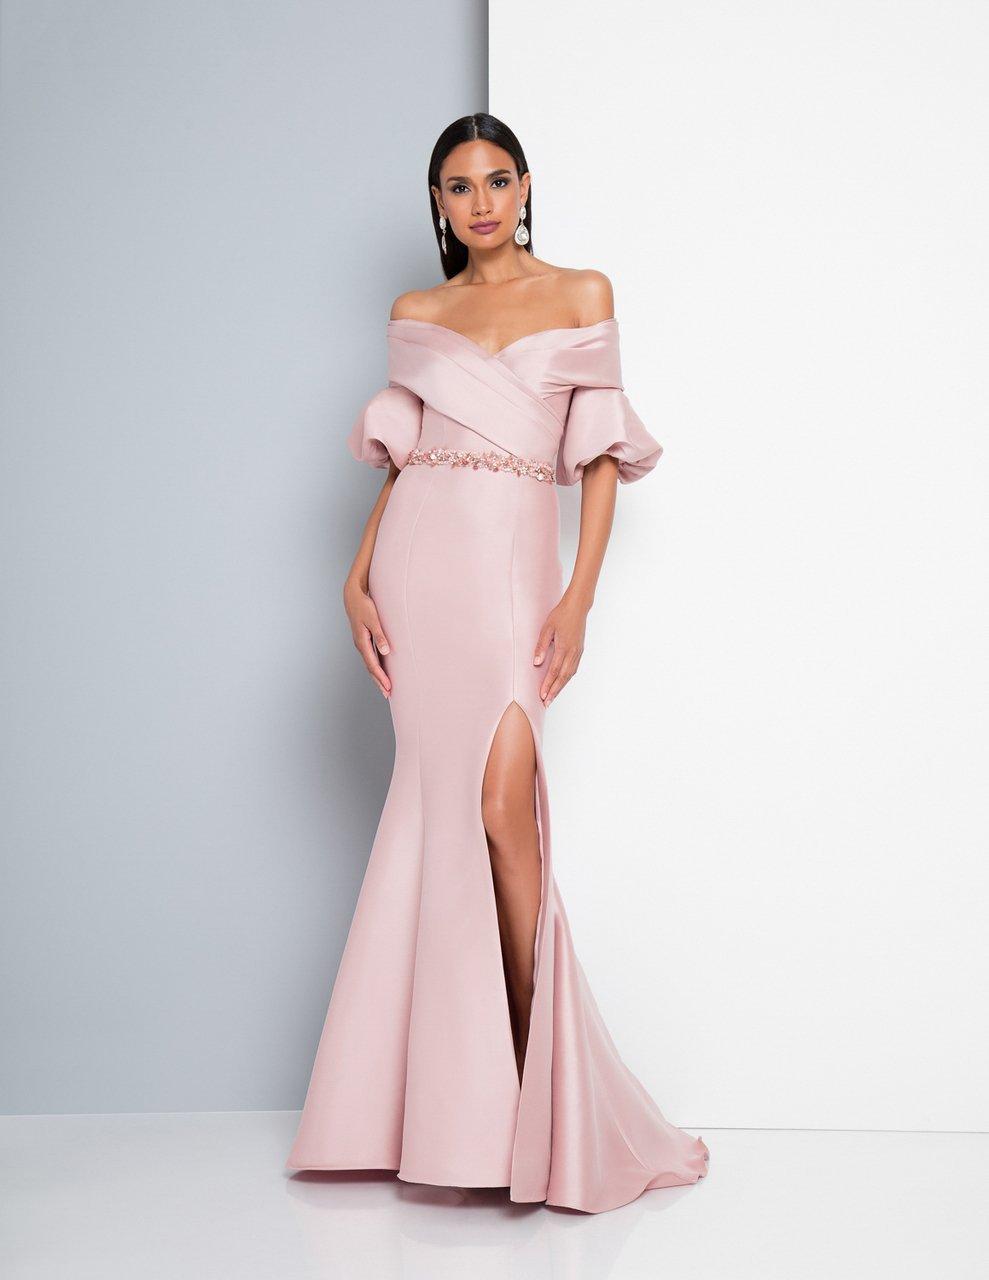 Terani Couture - 1811M6550 Puff Sleeve Off-Shoulder Mermaid Dress